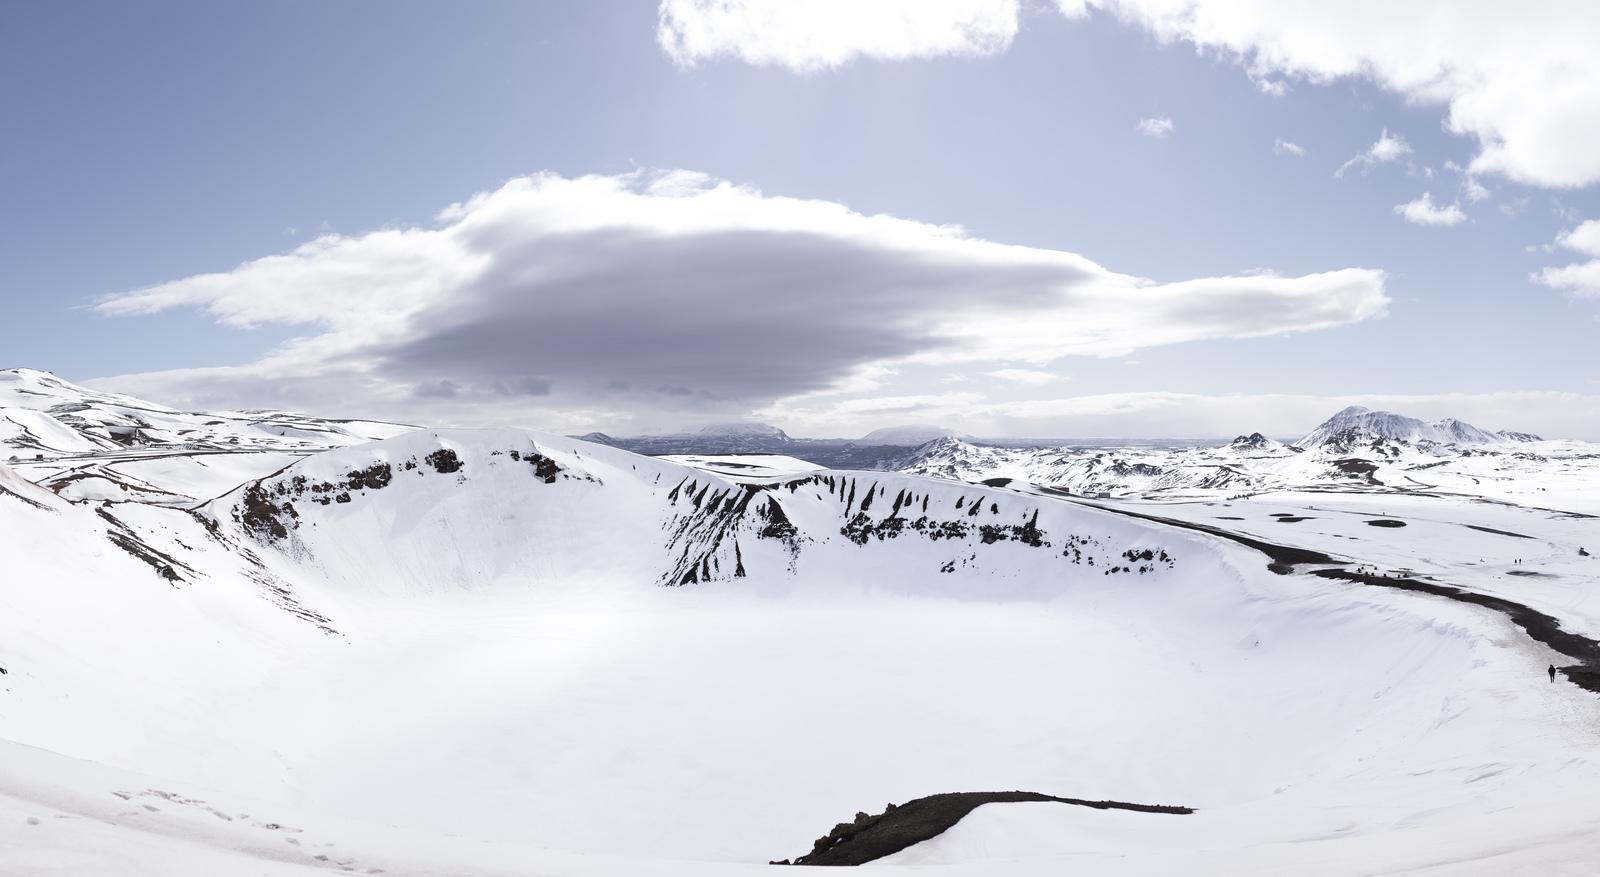 Le cratère Víti enneigé Víti